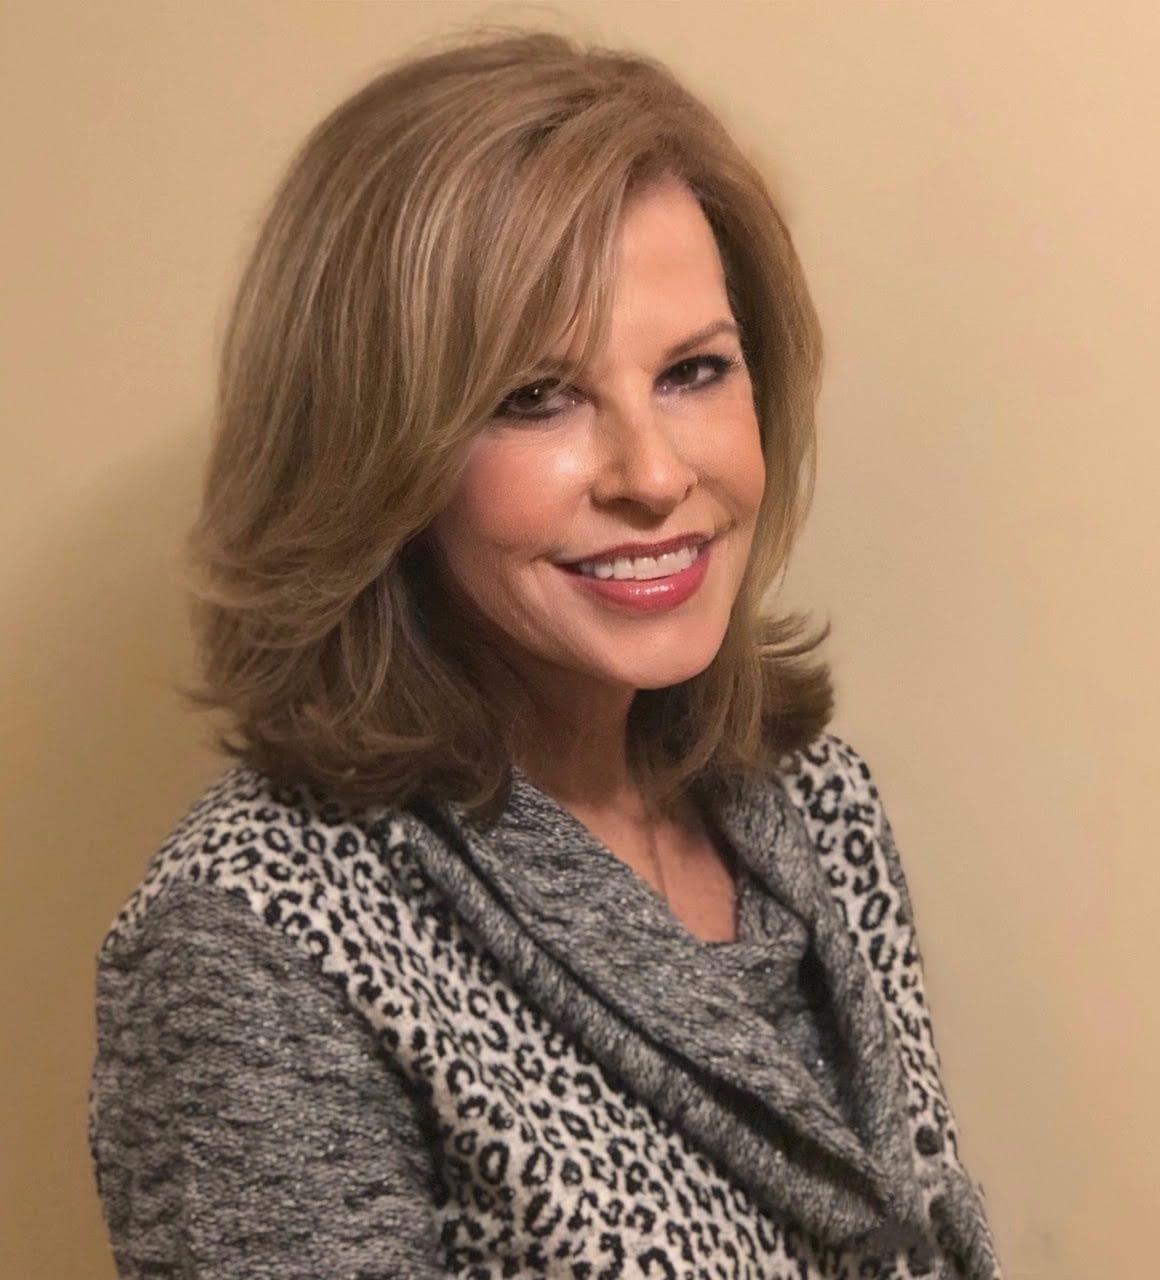 Sheila Charton